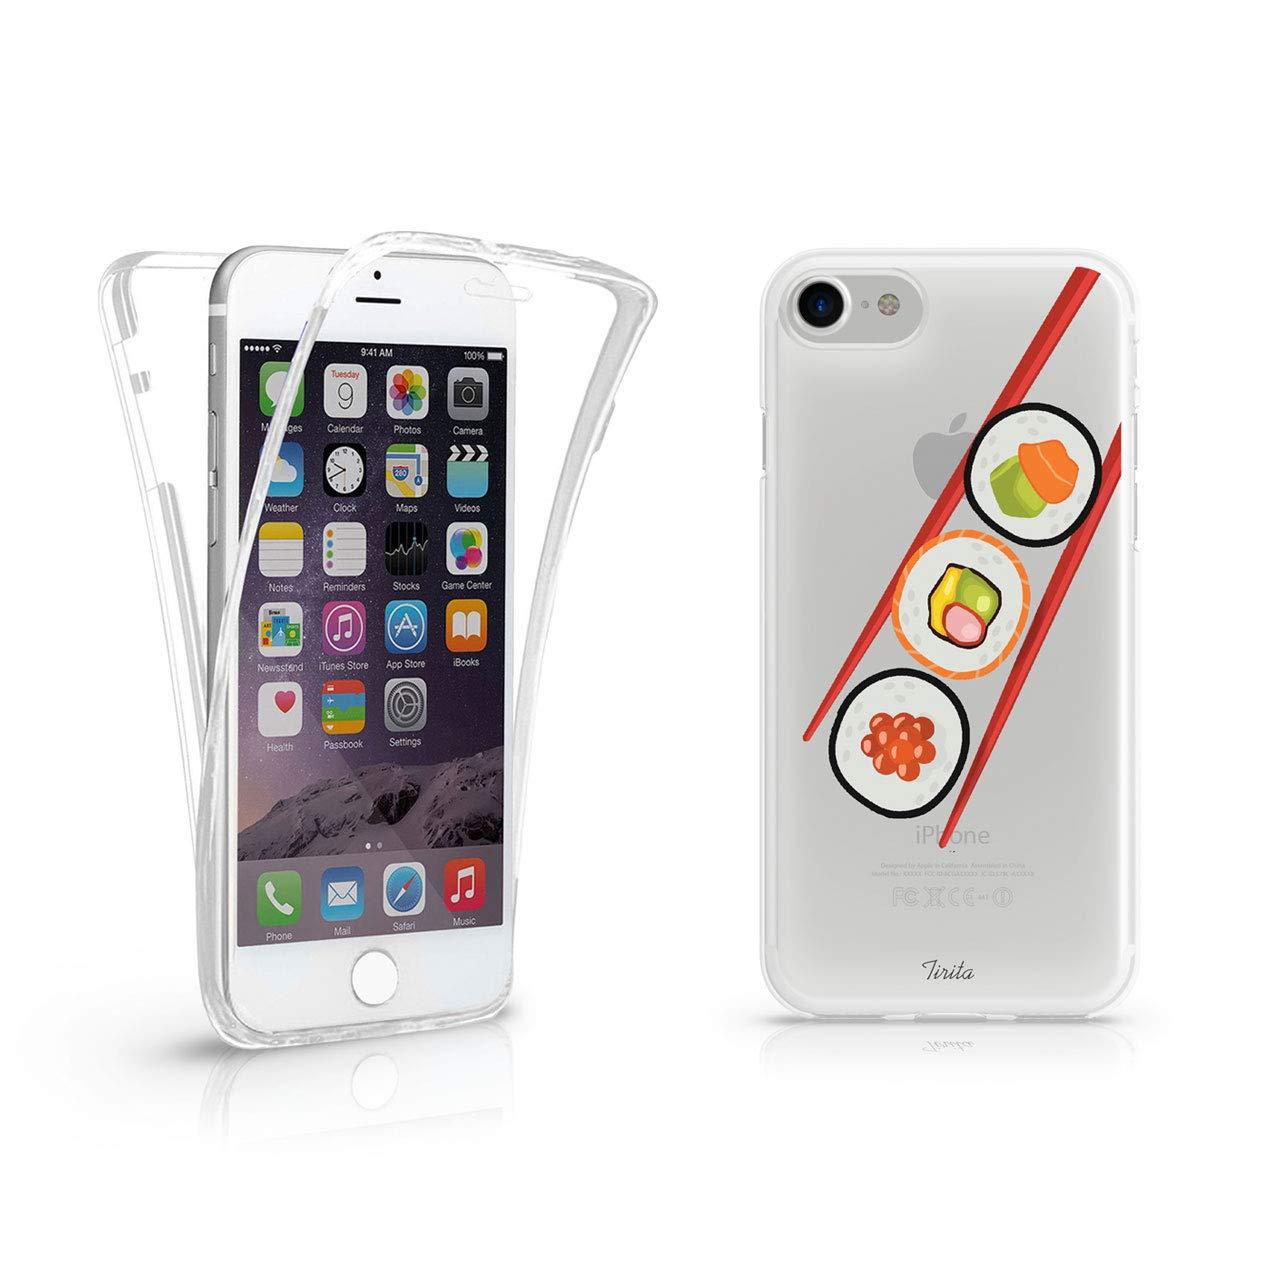 Iphone 6プラス&6 sプラスティリタフル360保護クリアソフトゲル電話ケース寿司和食日本流行ファッションギフトプレゼント   B07GL3913V